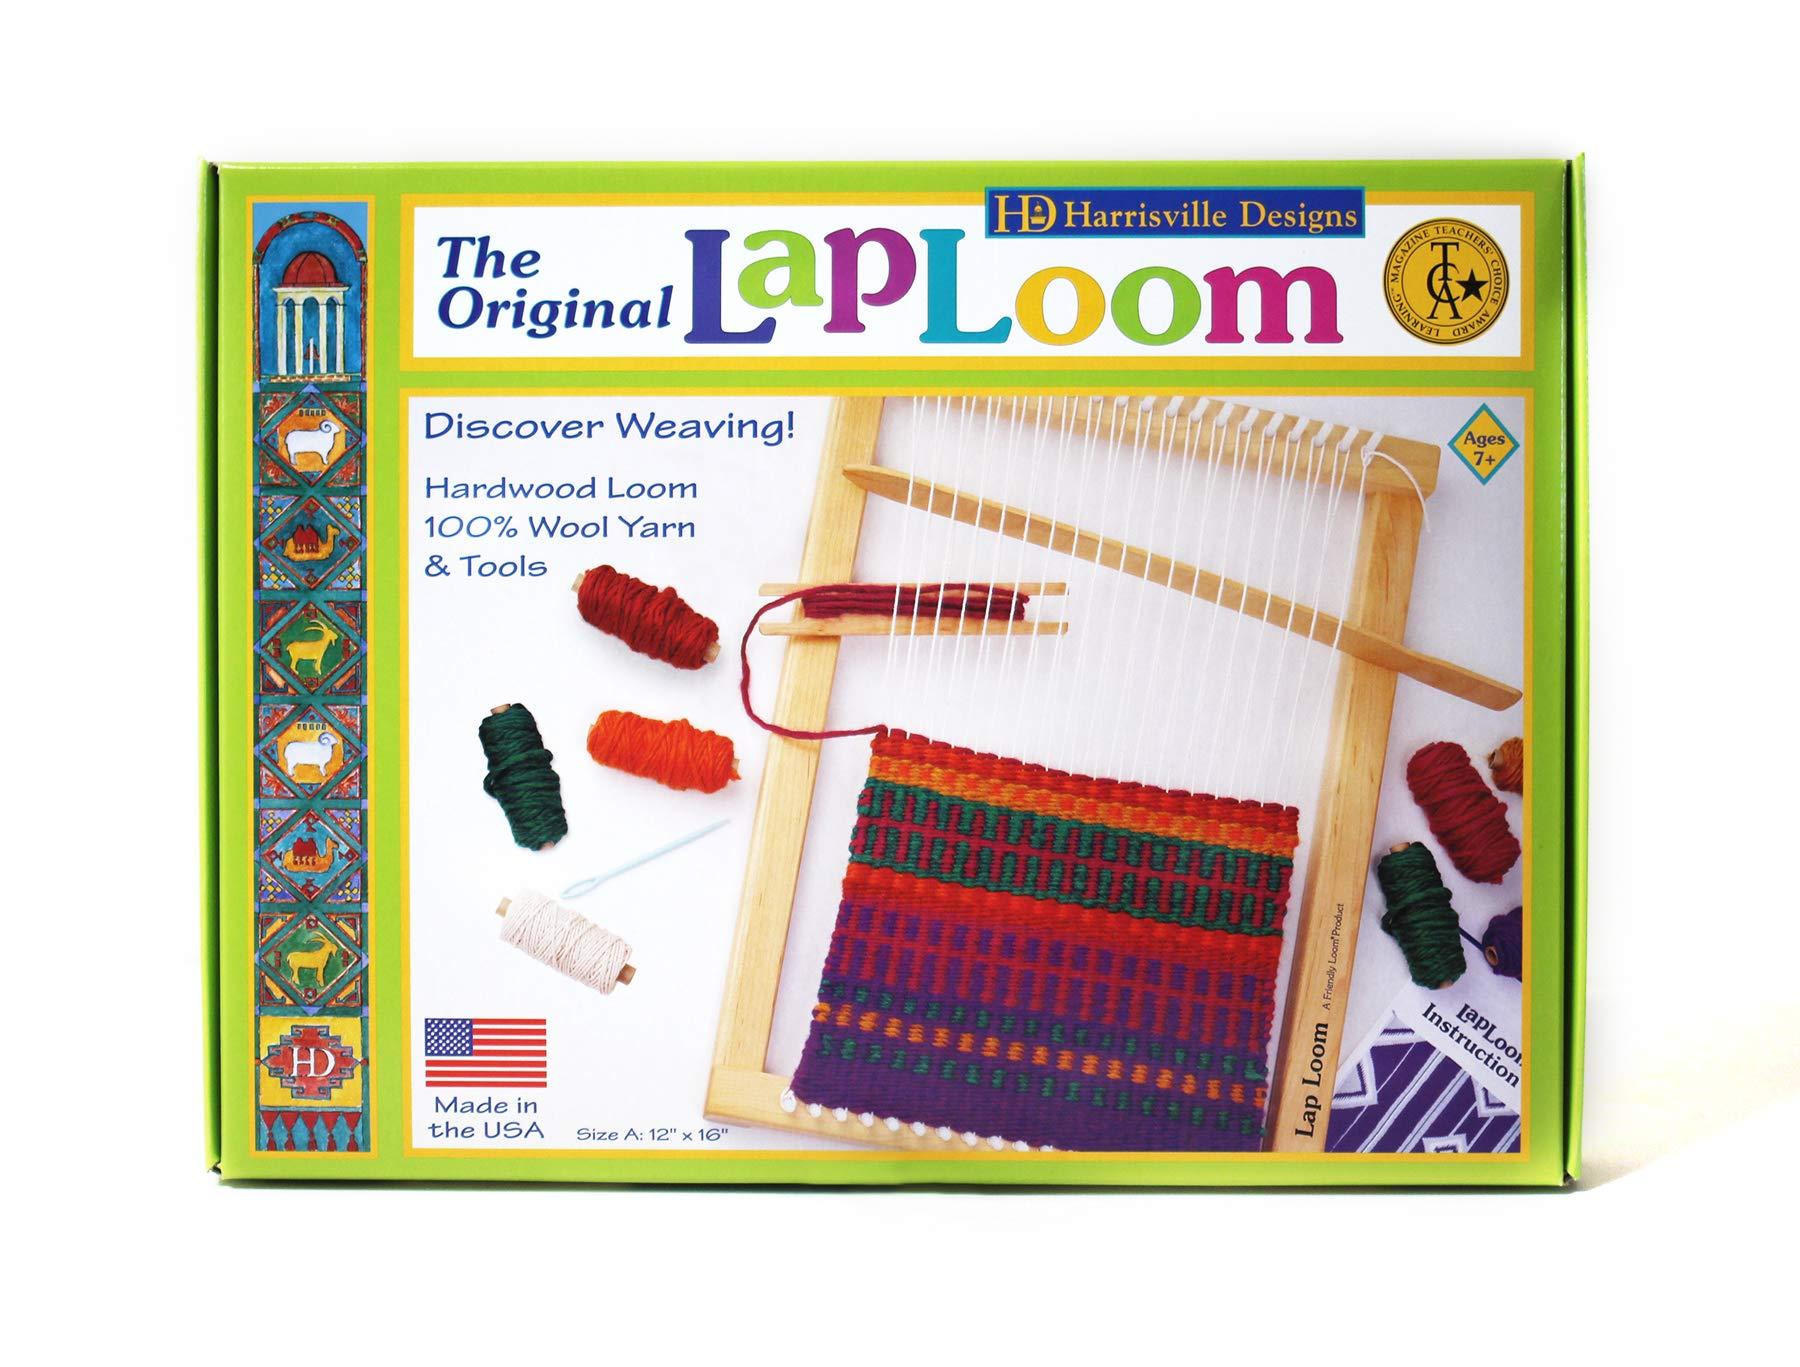 Harrisville Designs Lap Loom (Style A) by Harrisville Designs